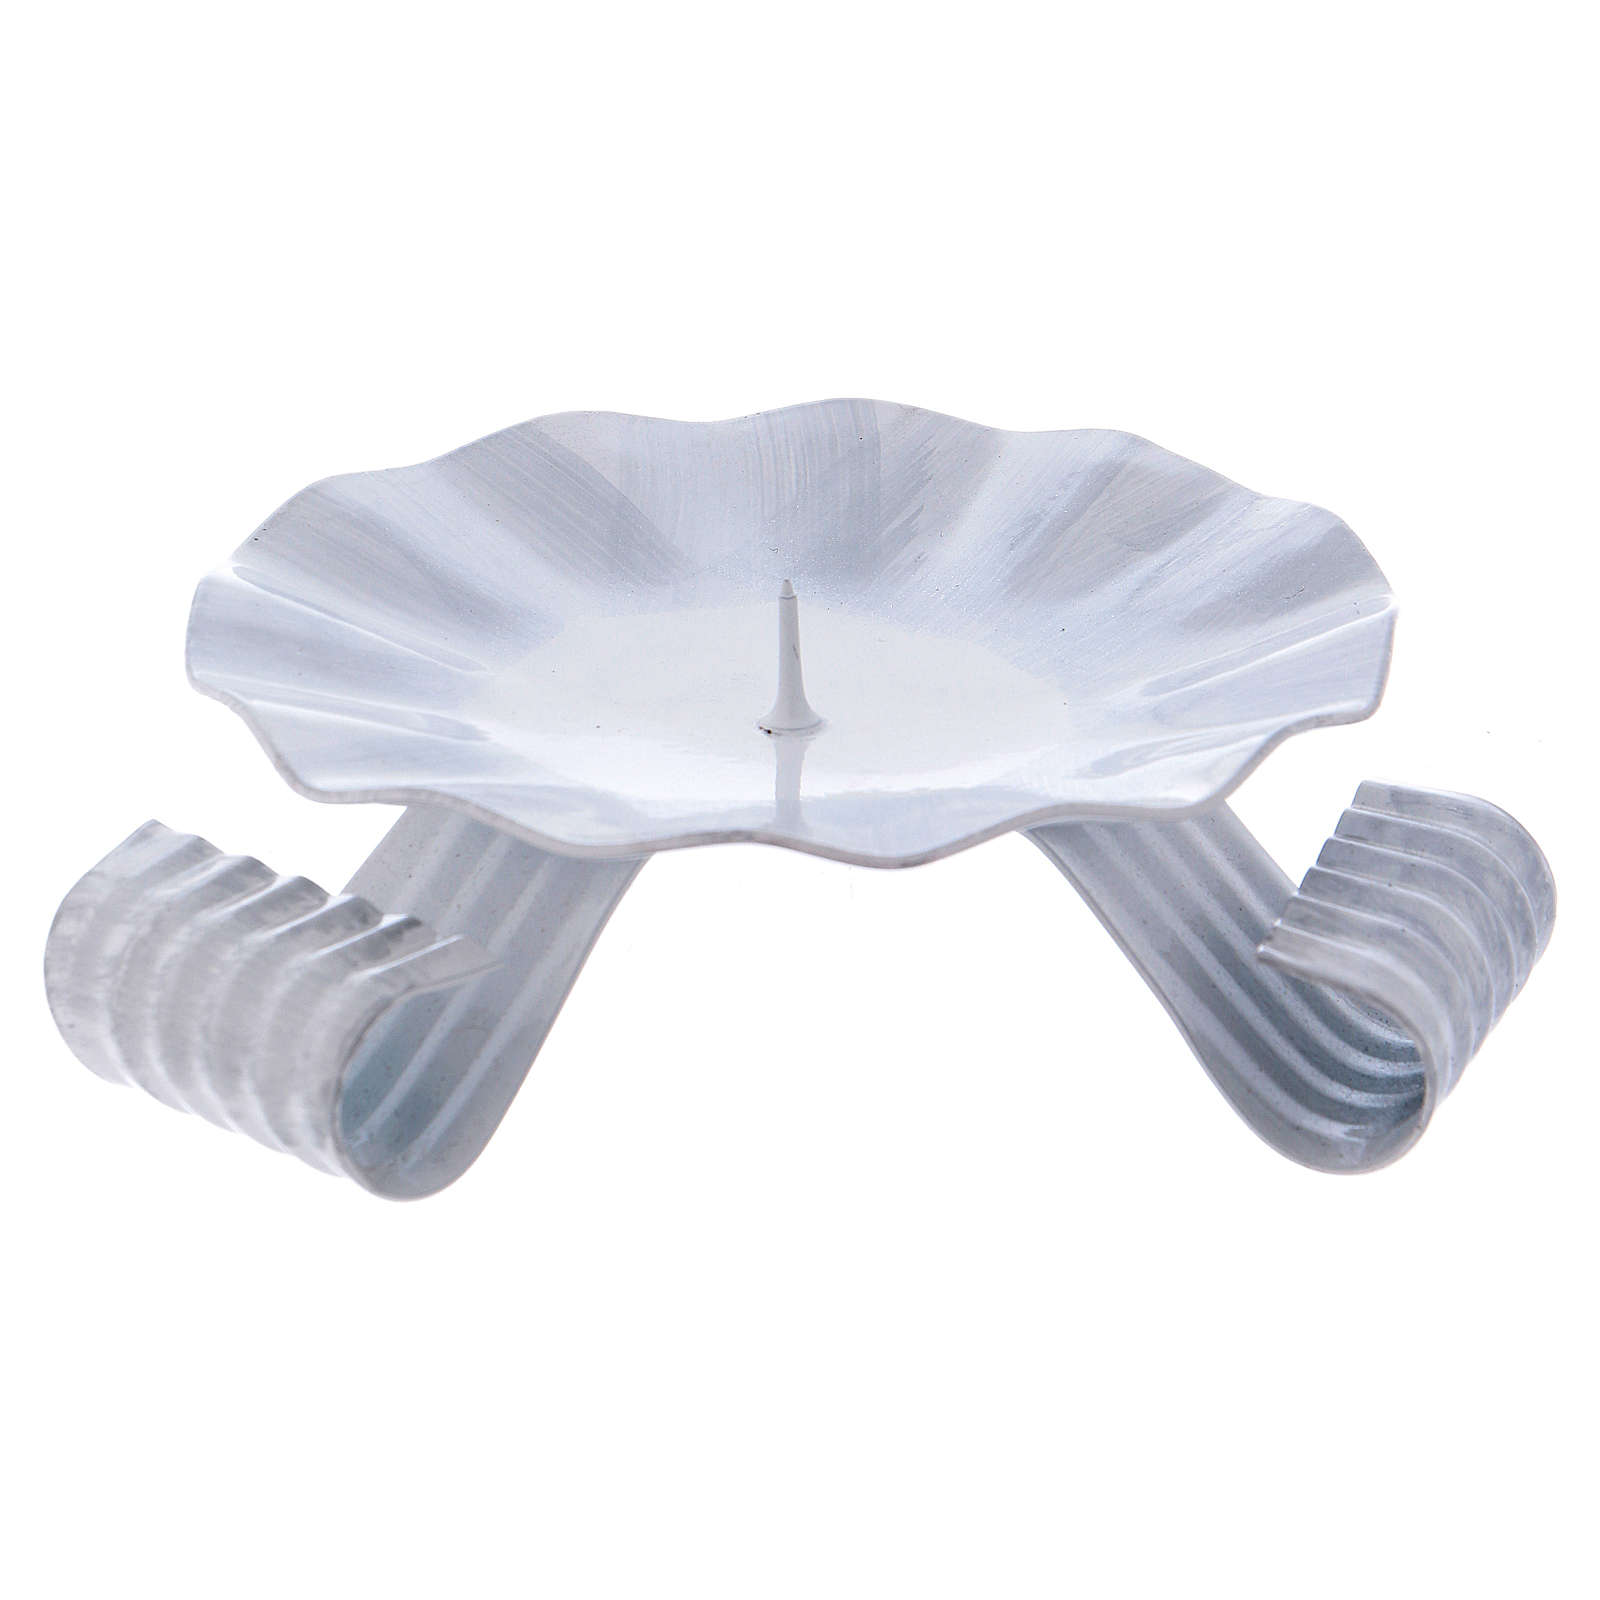 Portacandele in ferro bianco e argento spuntone diametro 8 cm 3